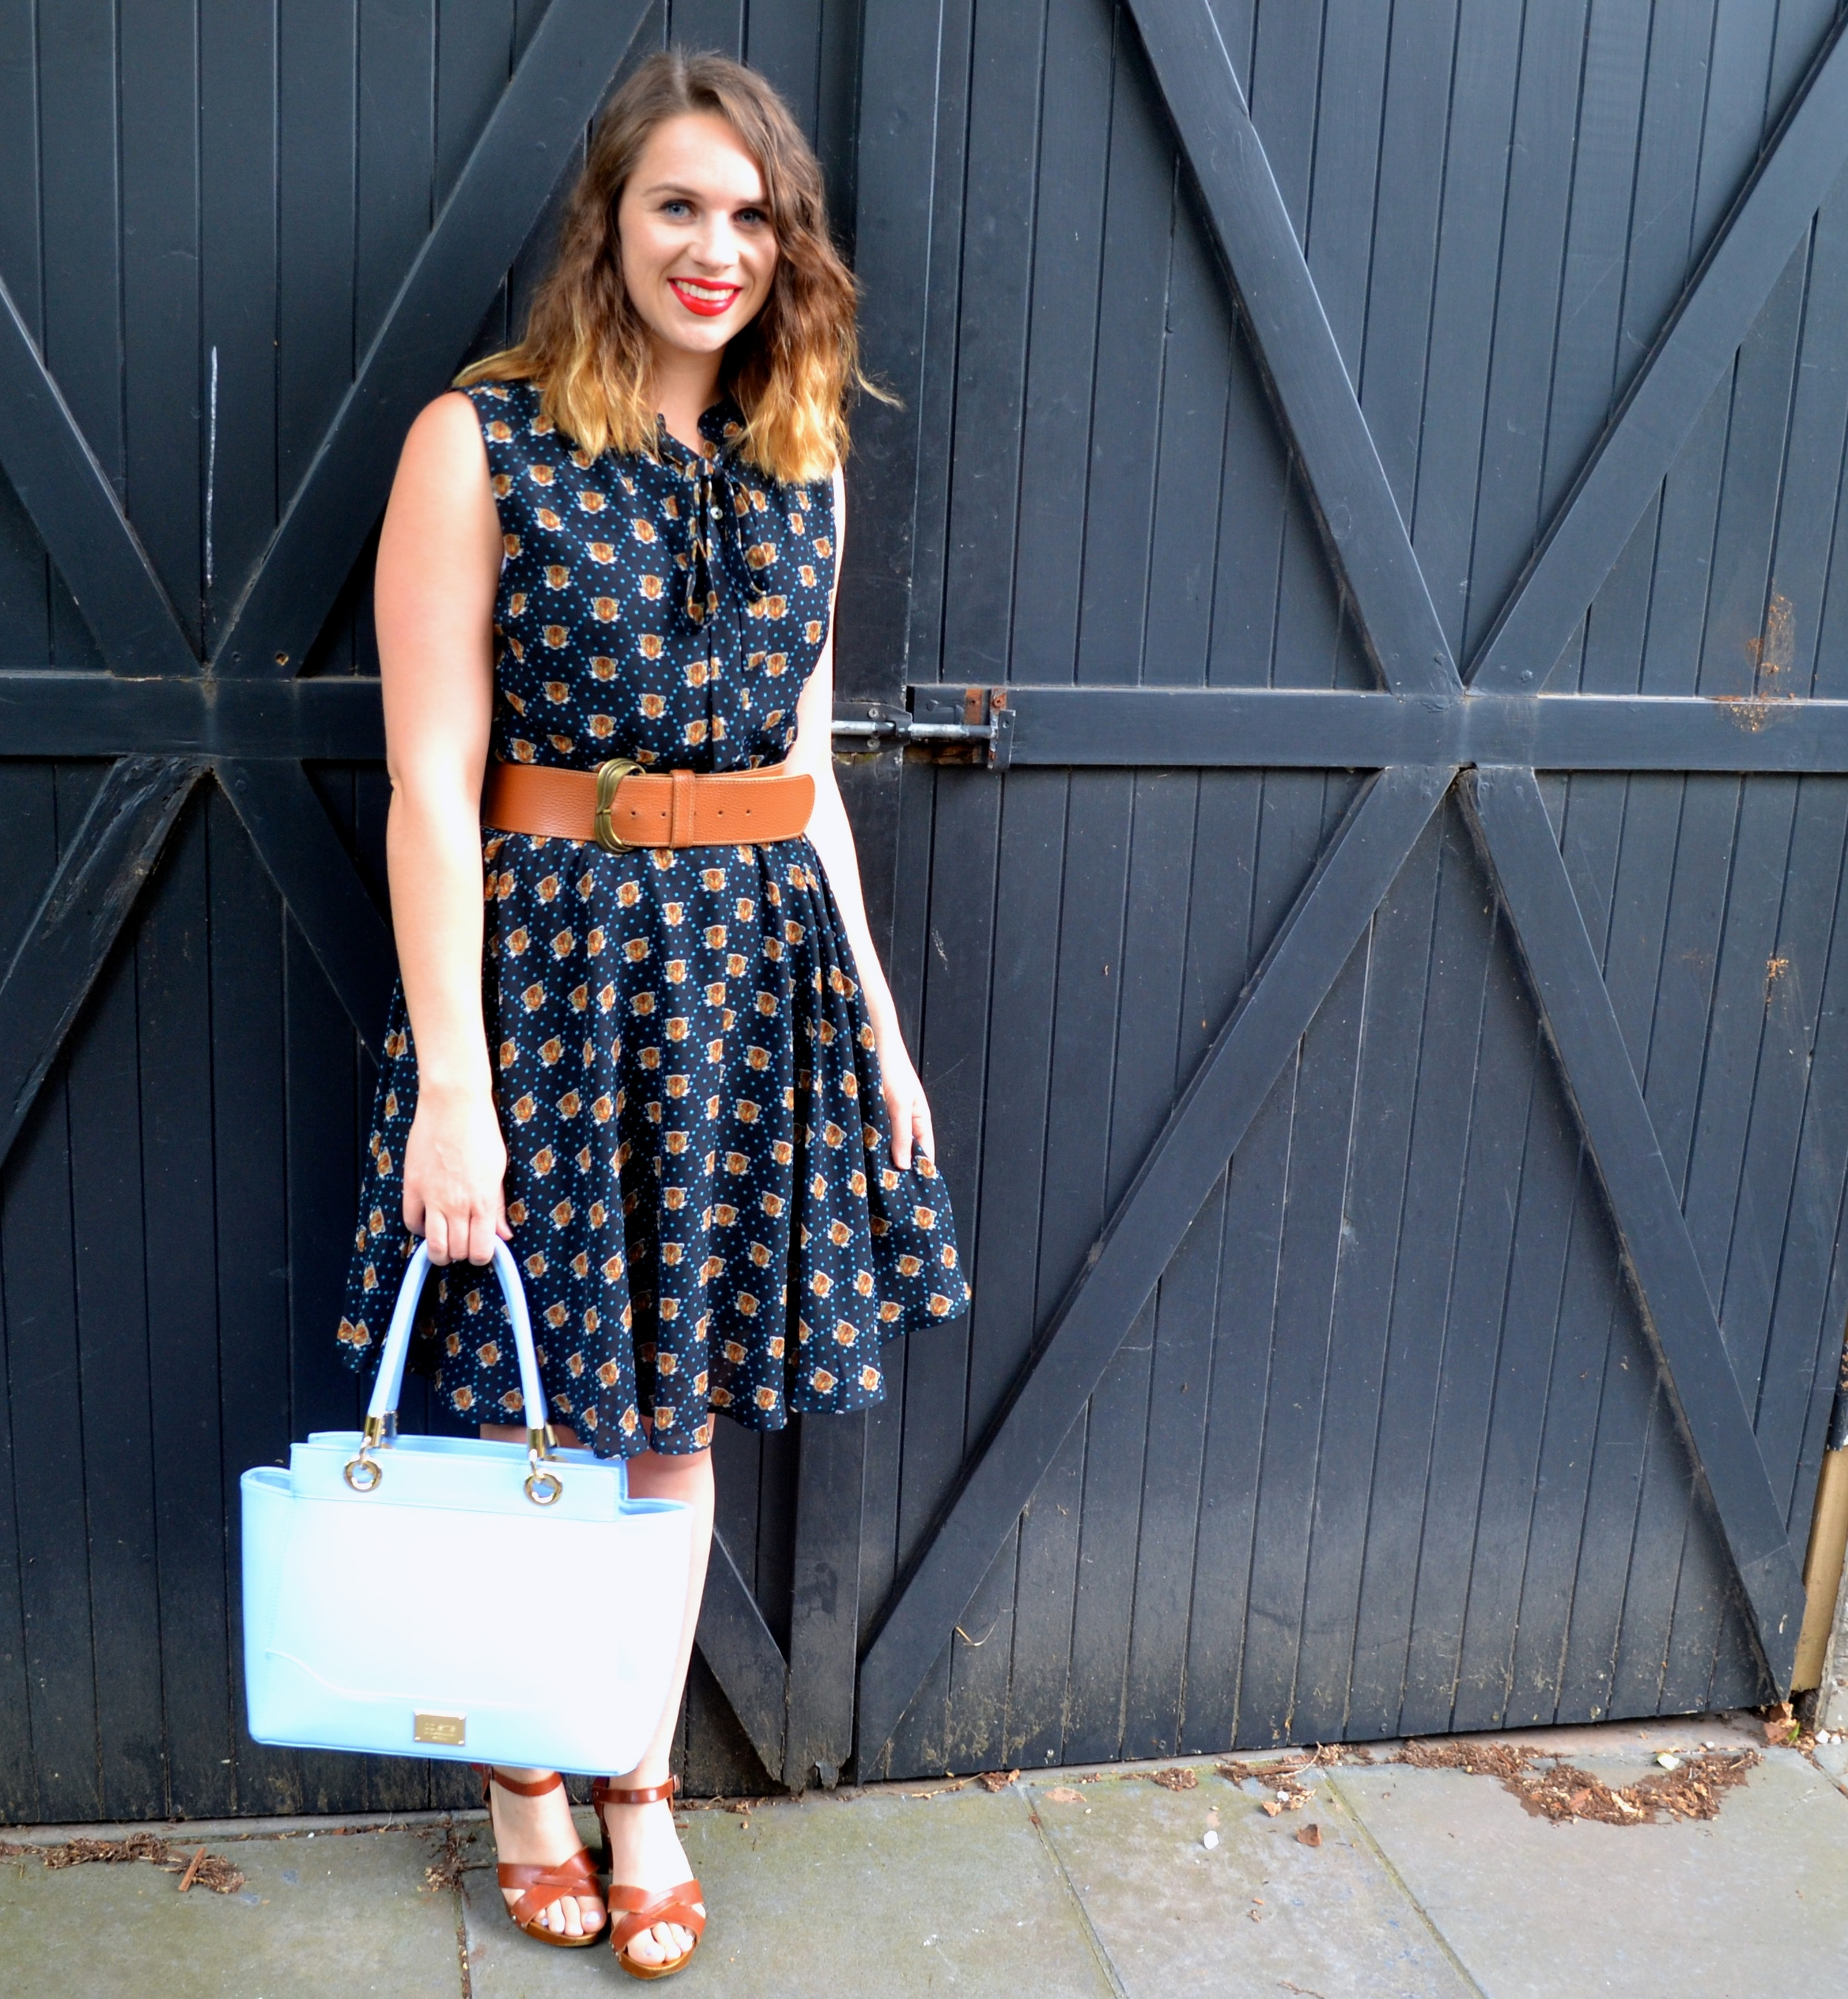 blue-bag-brown-fox-dress